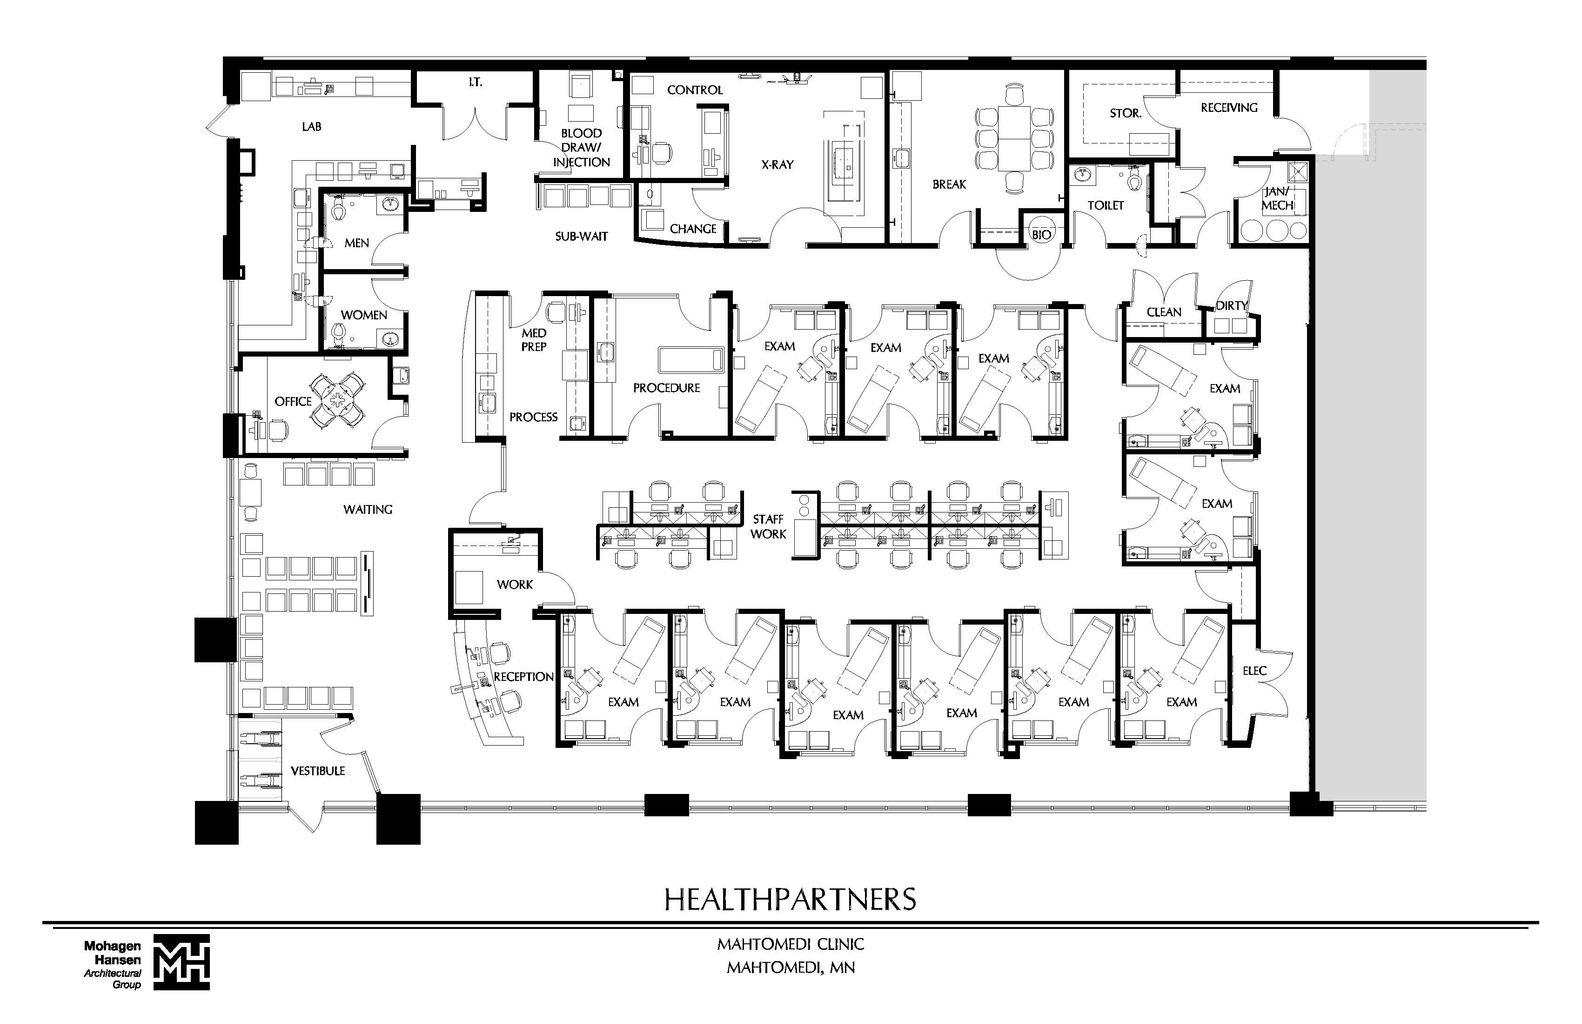 Cs interior design for X ray room floor plan